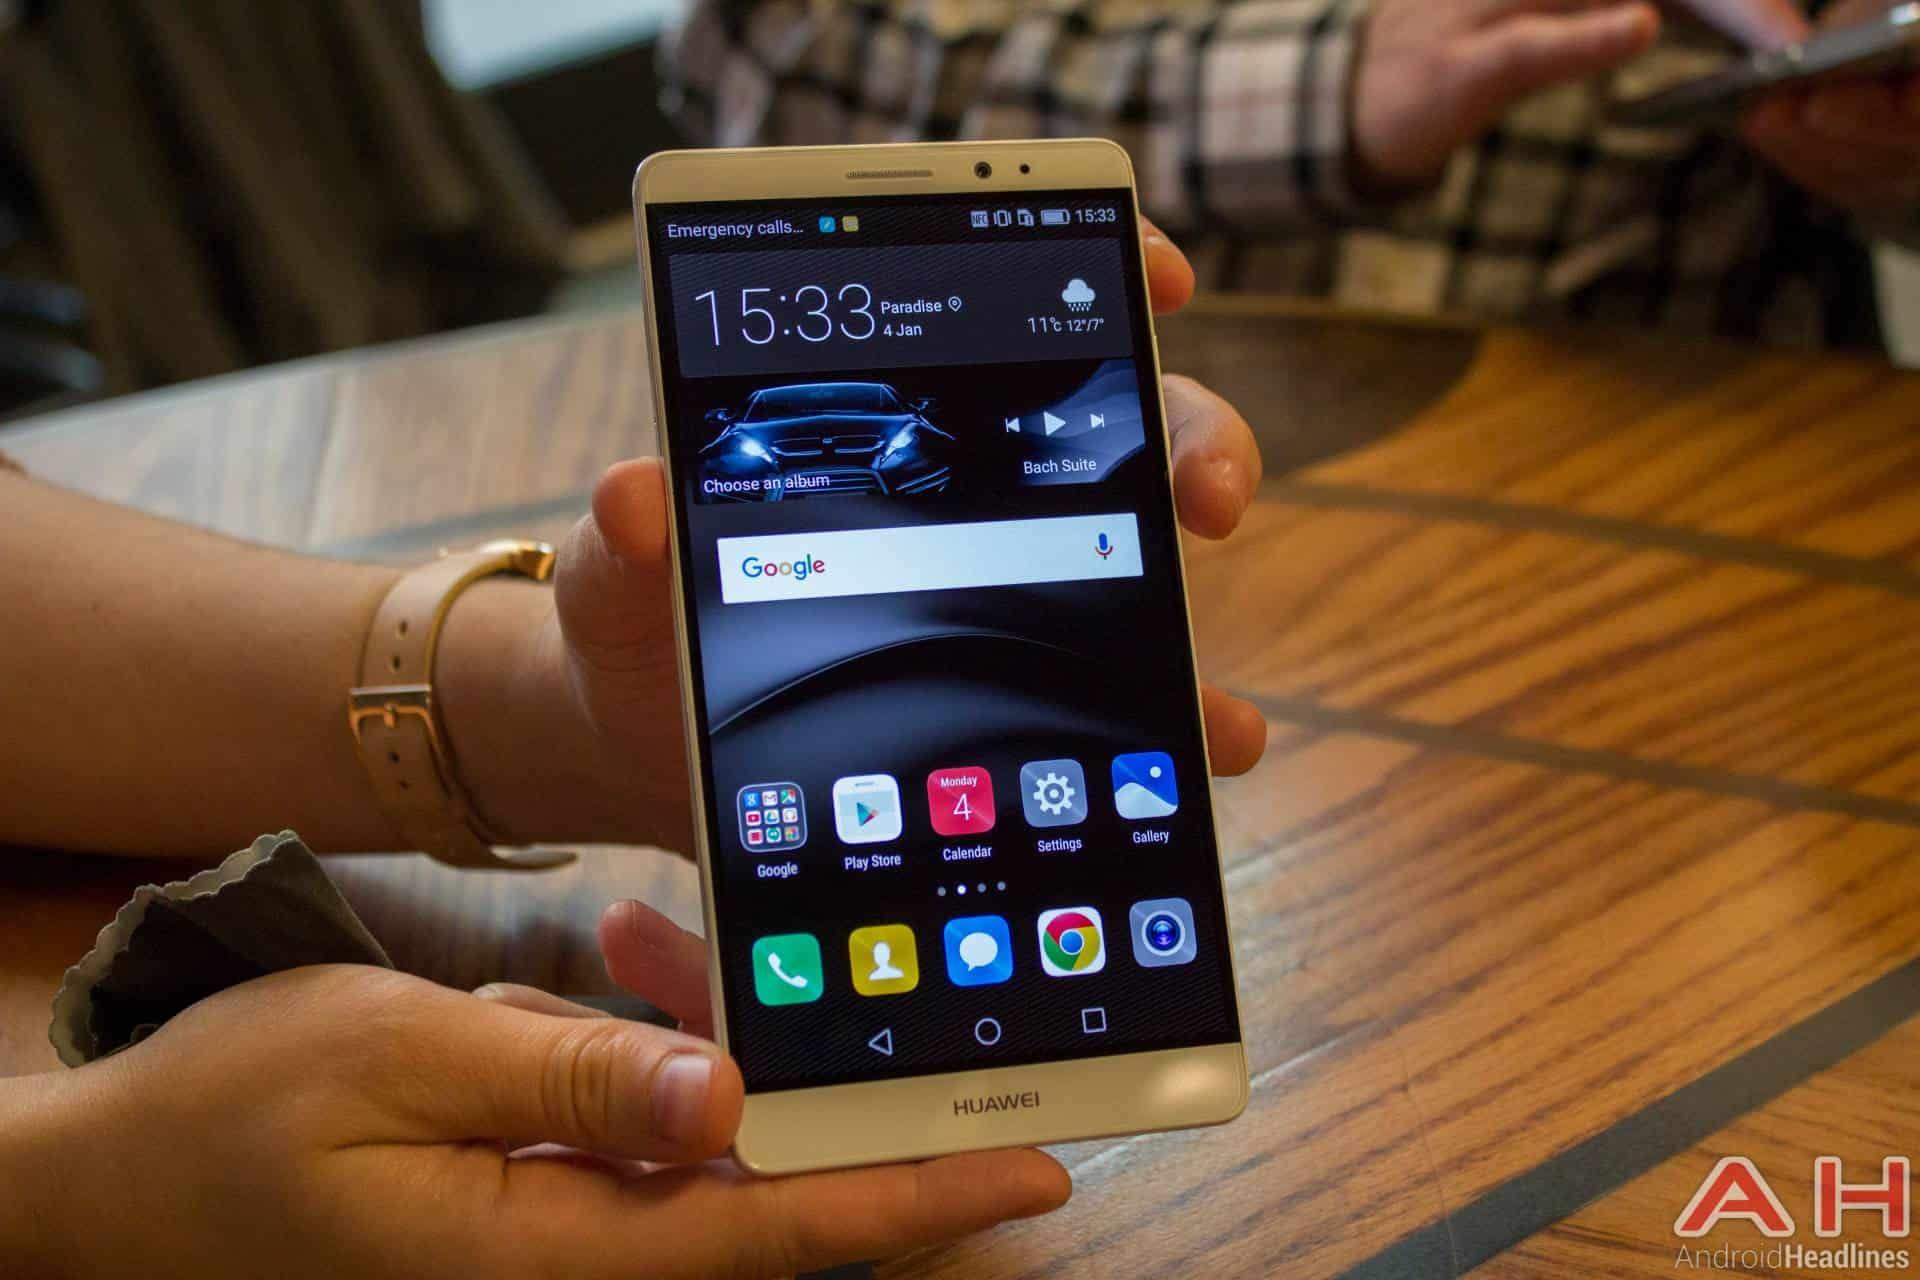 Huawei Mate 8 CES 2016 AH 2